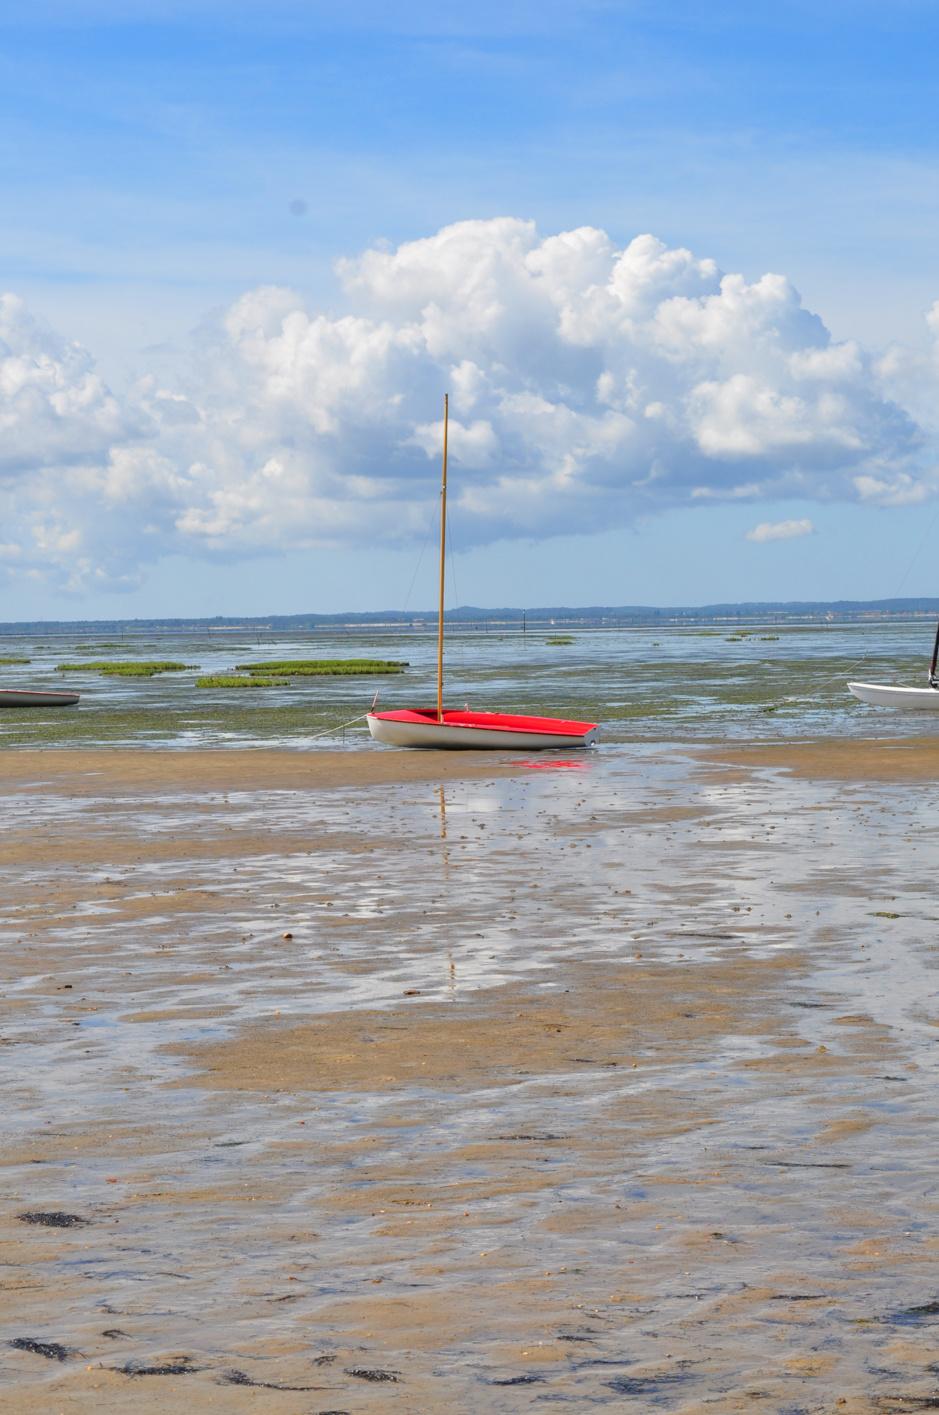 Bateau à Taussat, bassin à marée basse